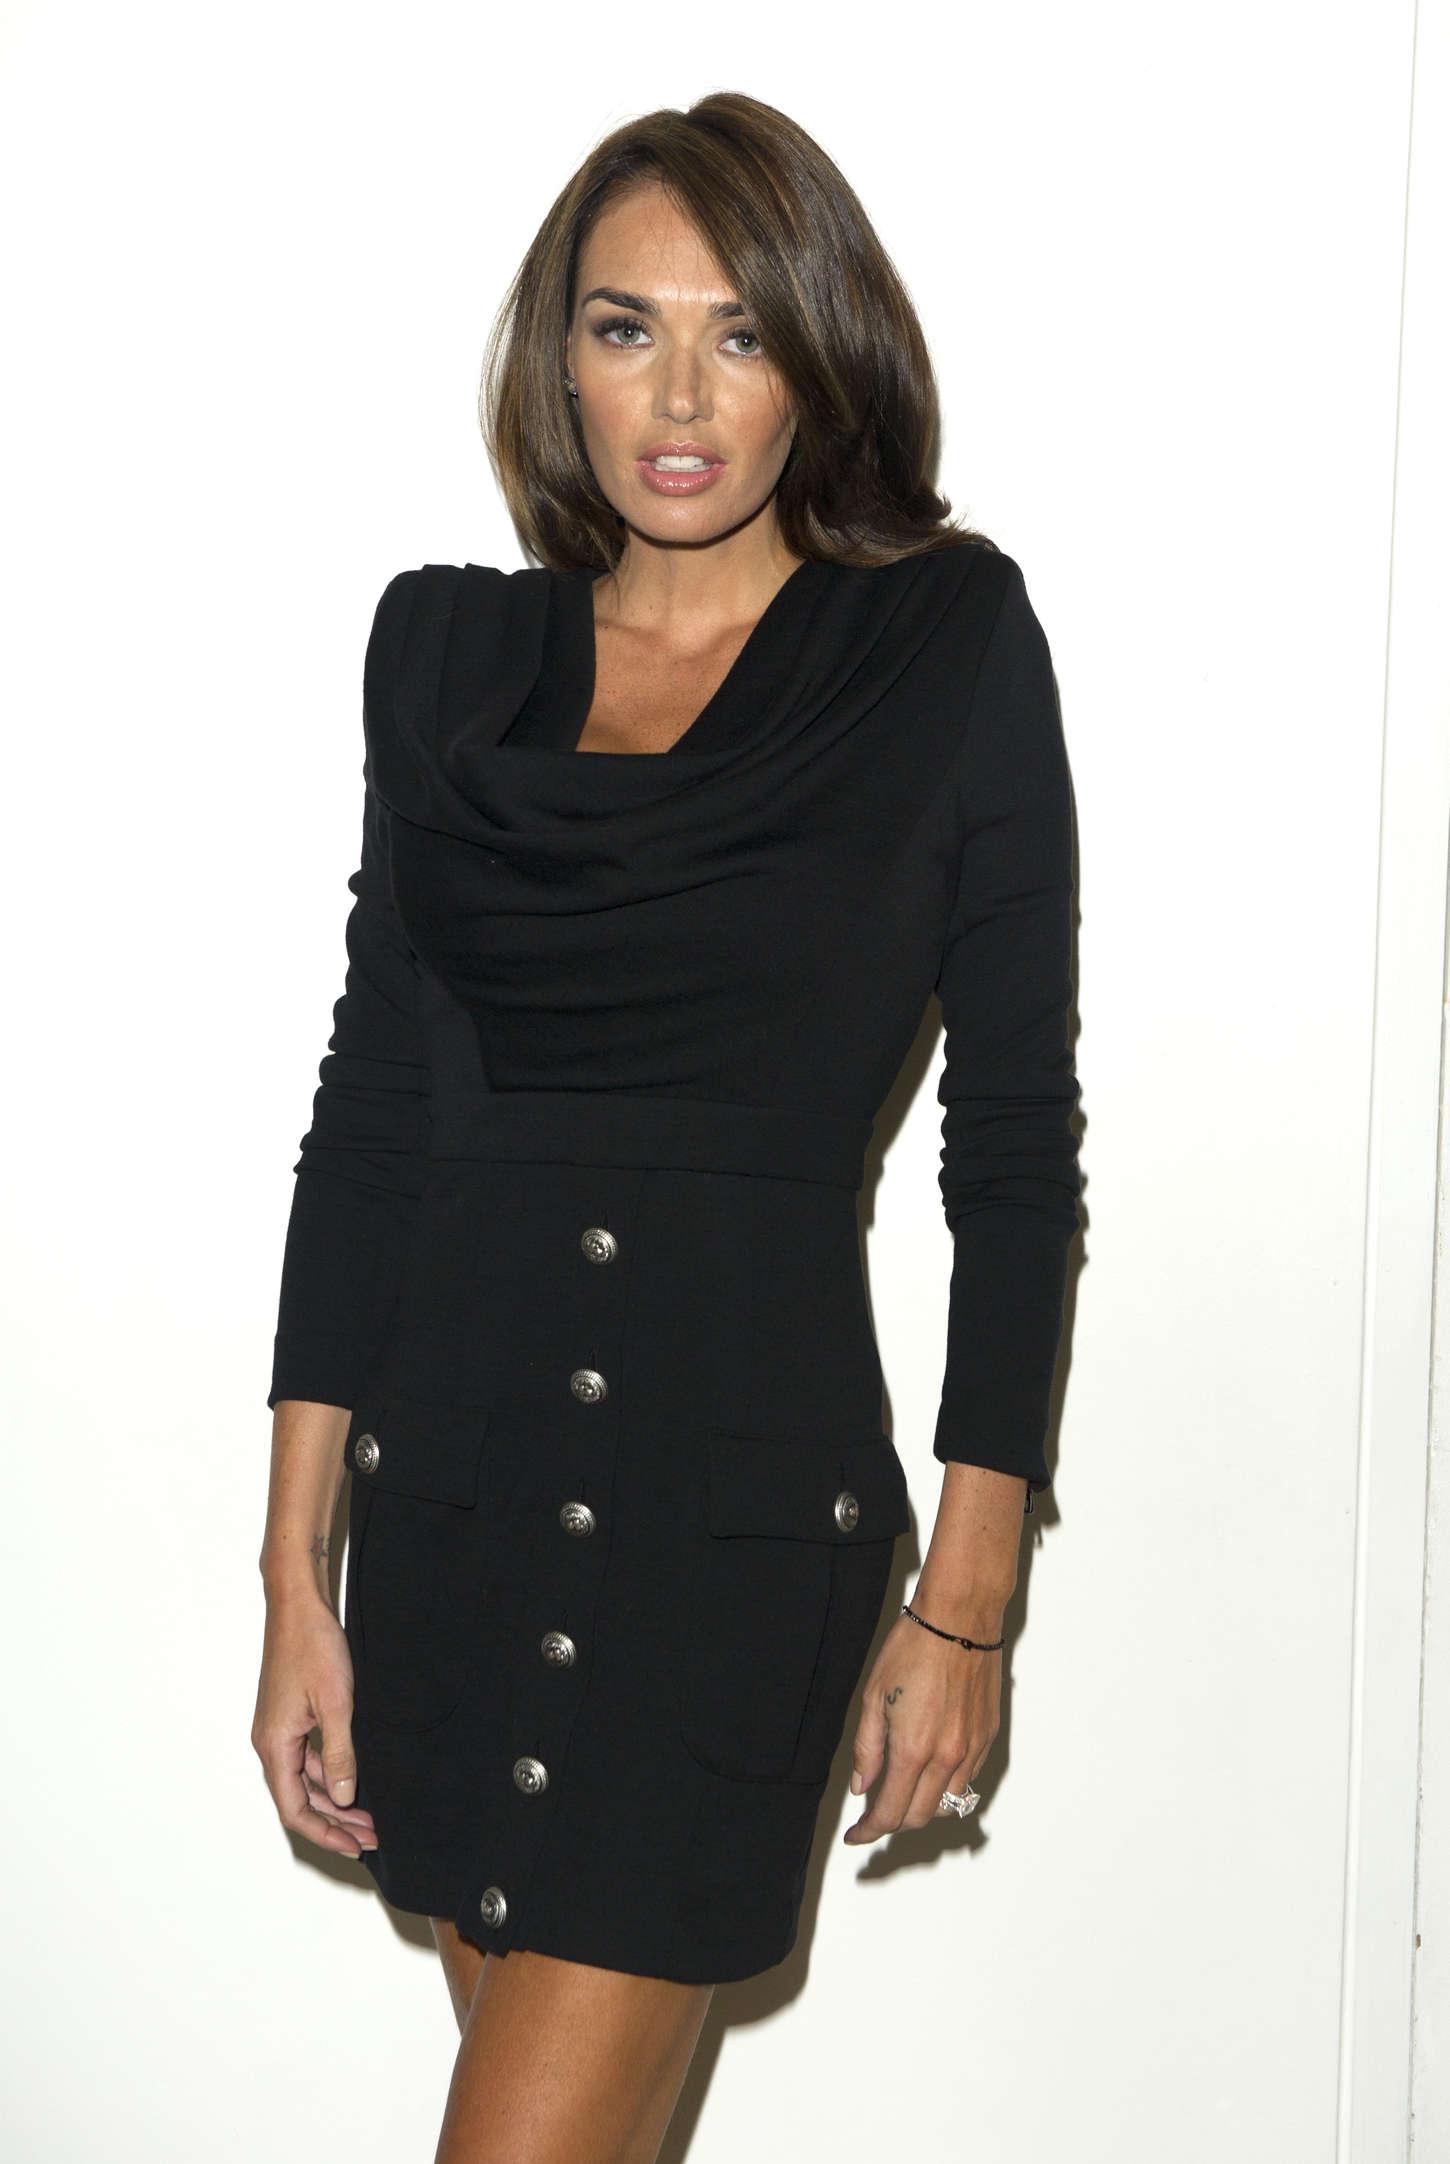 Tamara Ecclestone Julien Macdonald Show SS London Fashion Week